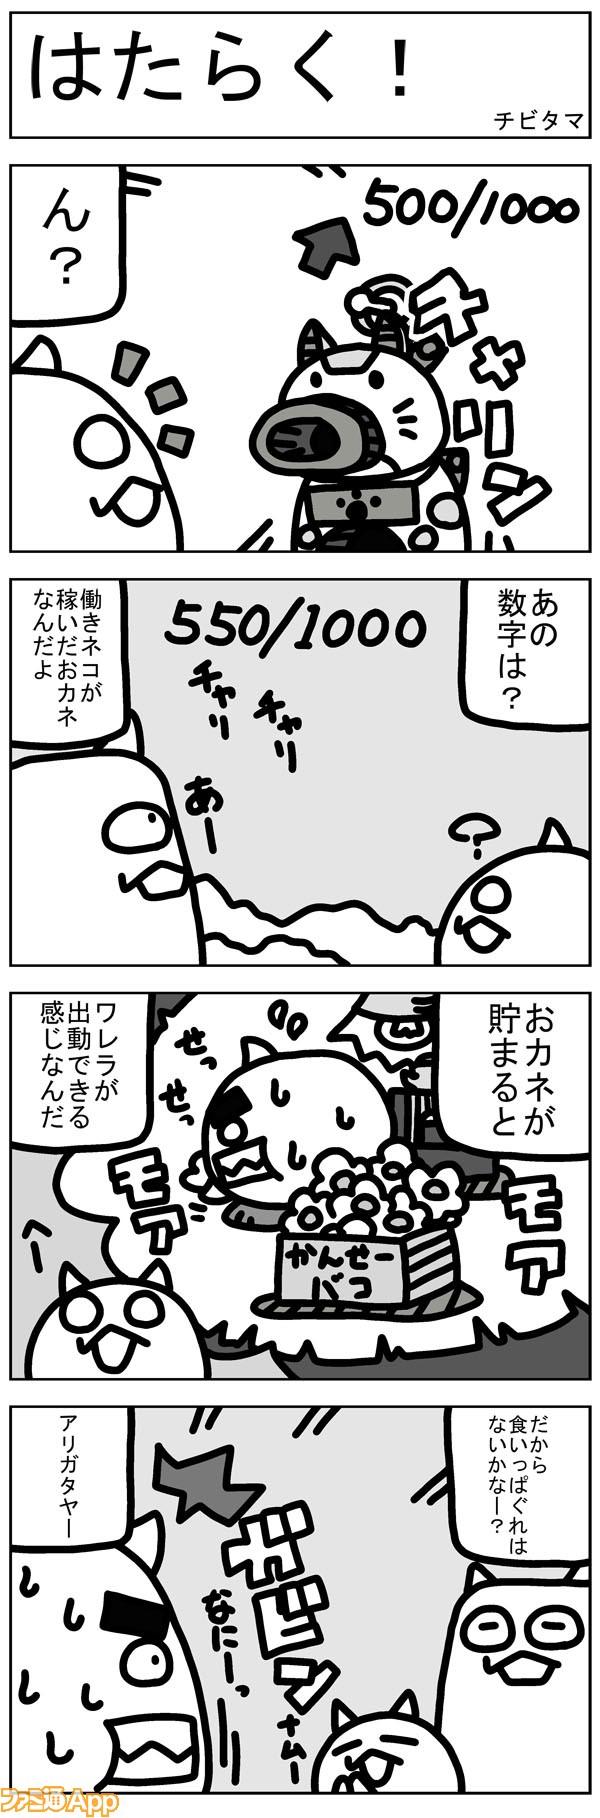 13tibi_003